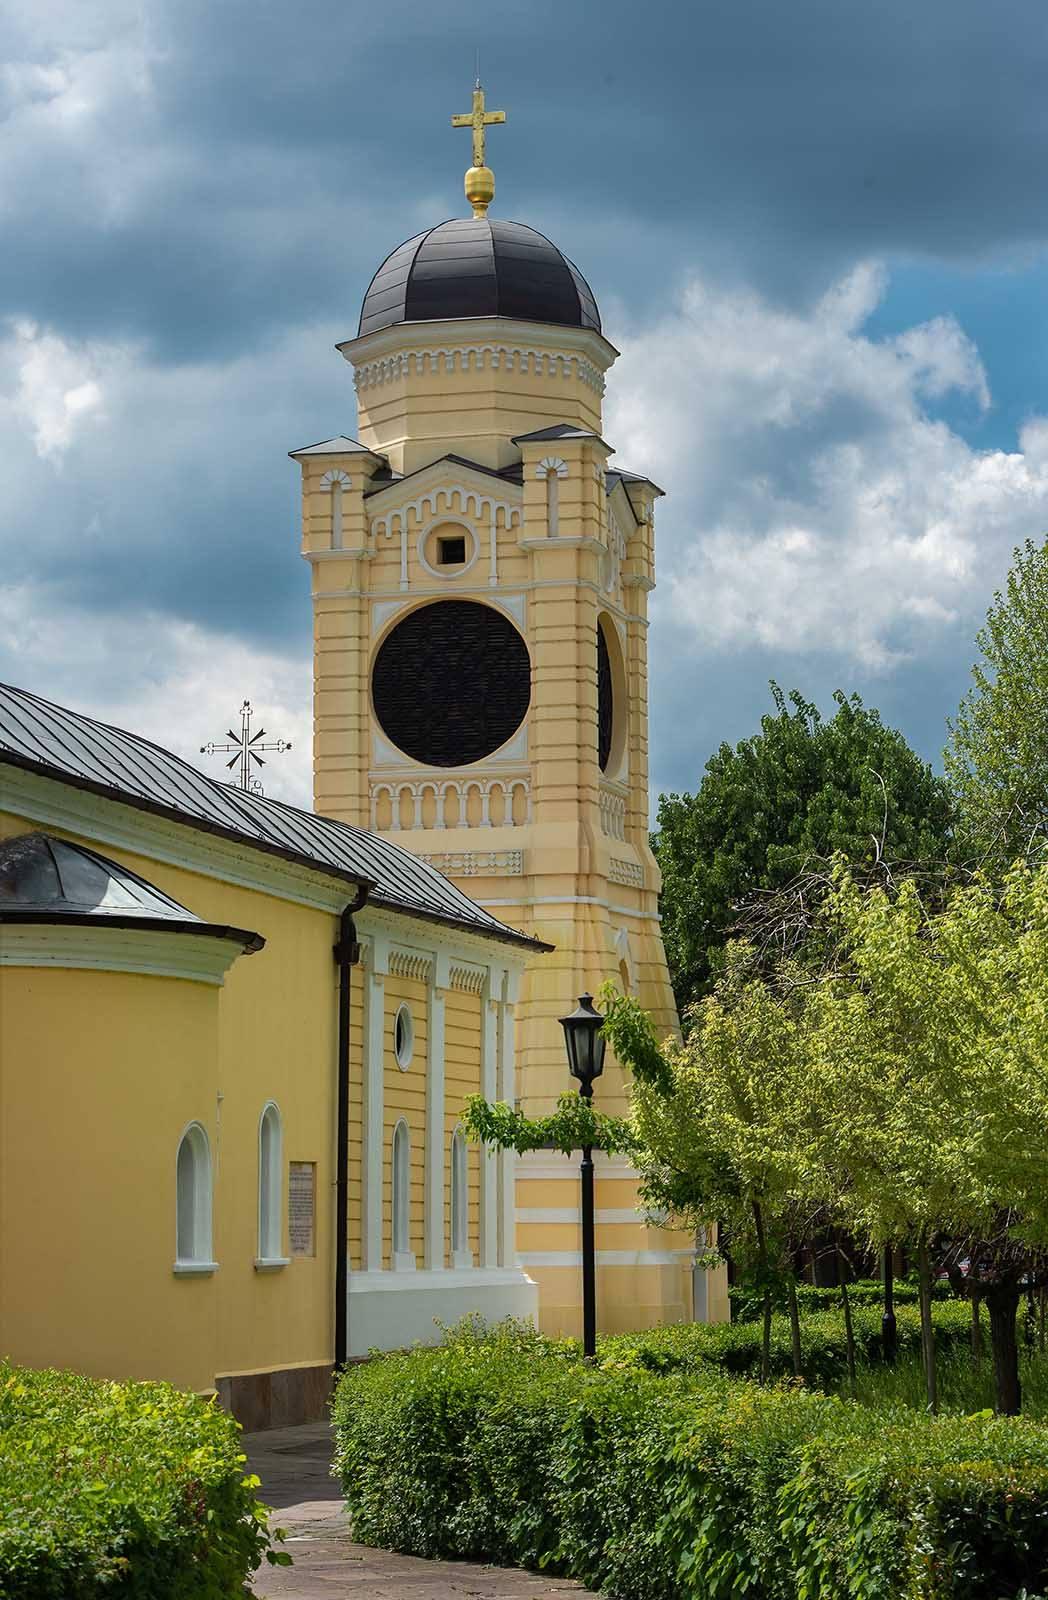 Foto: Zoran Petrović